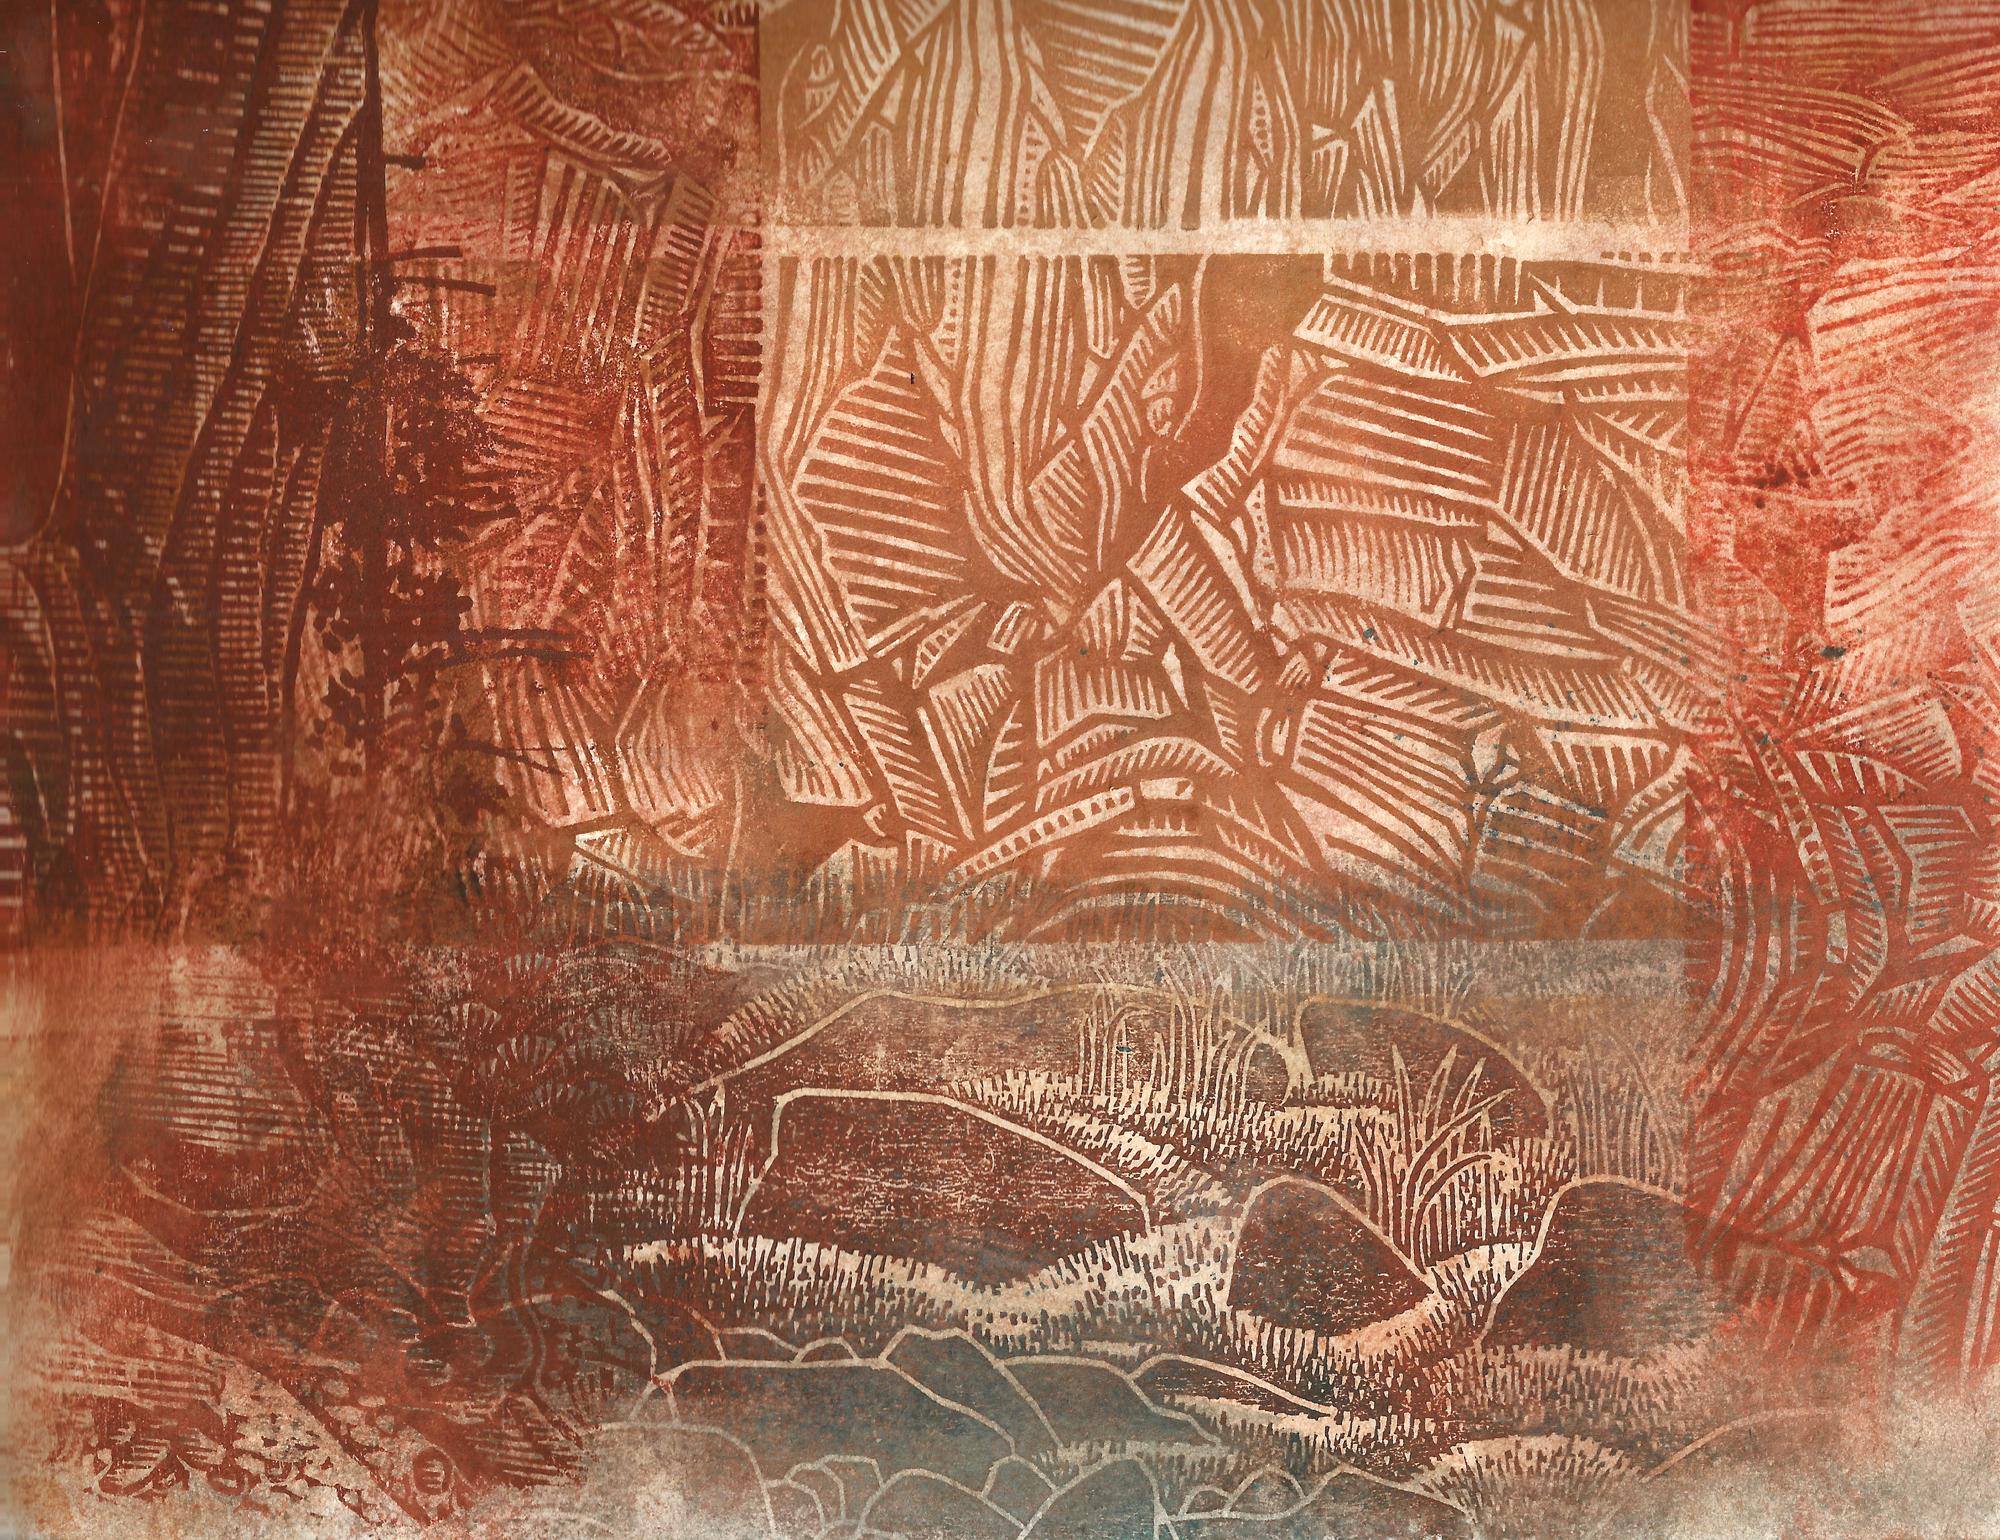 Relief print, watercolor, 2014